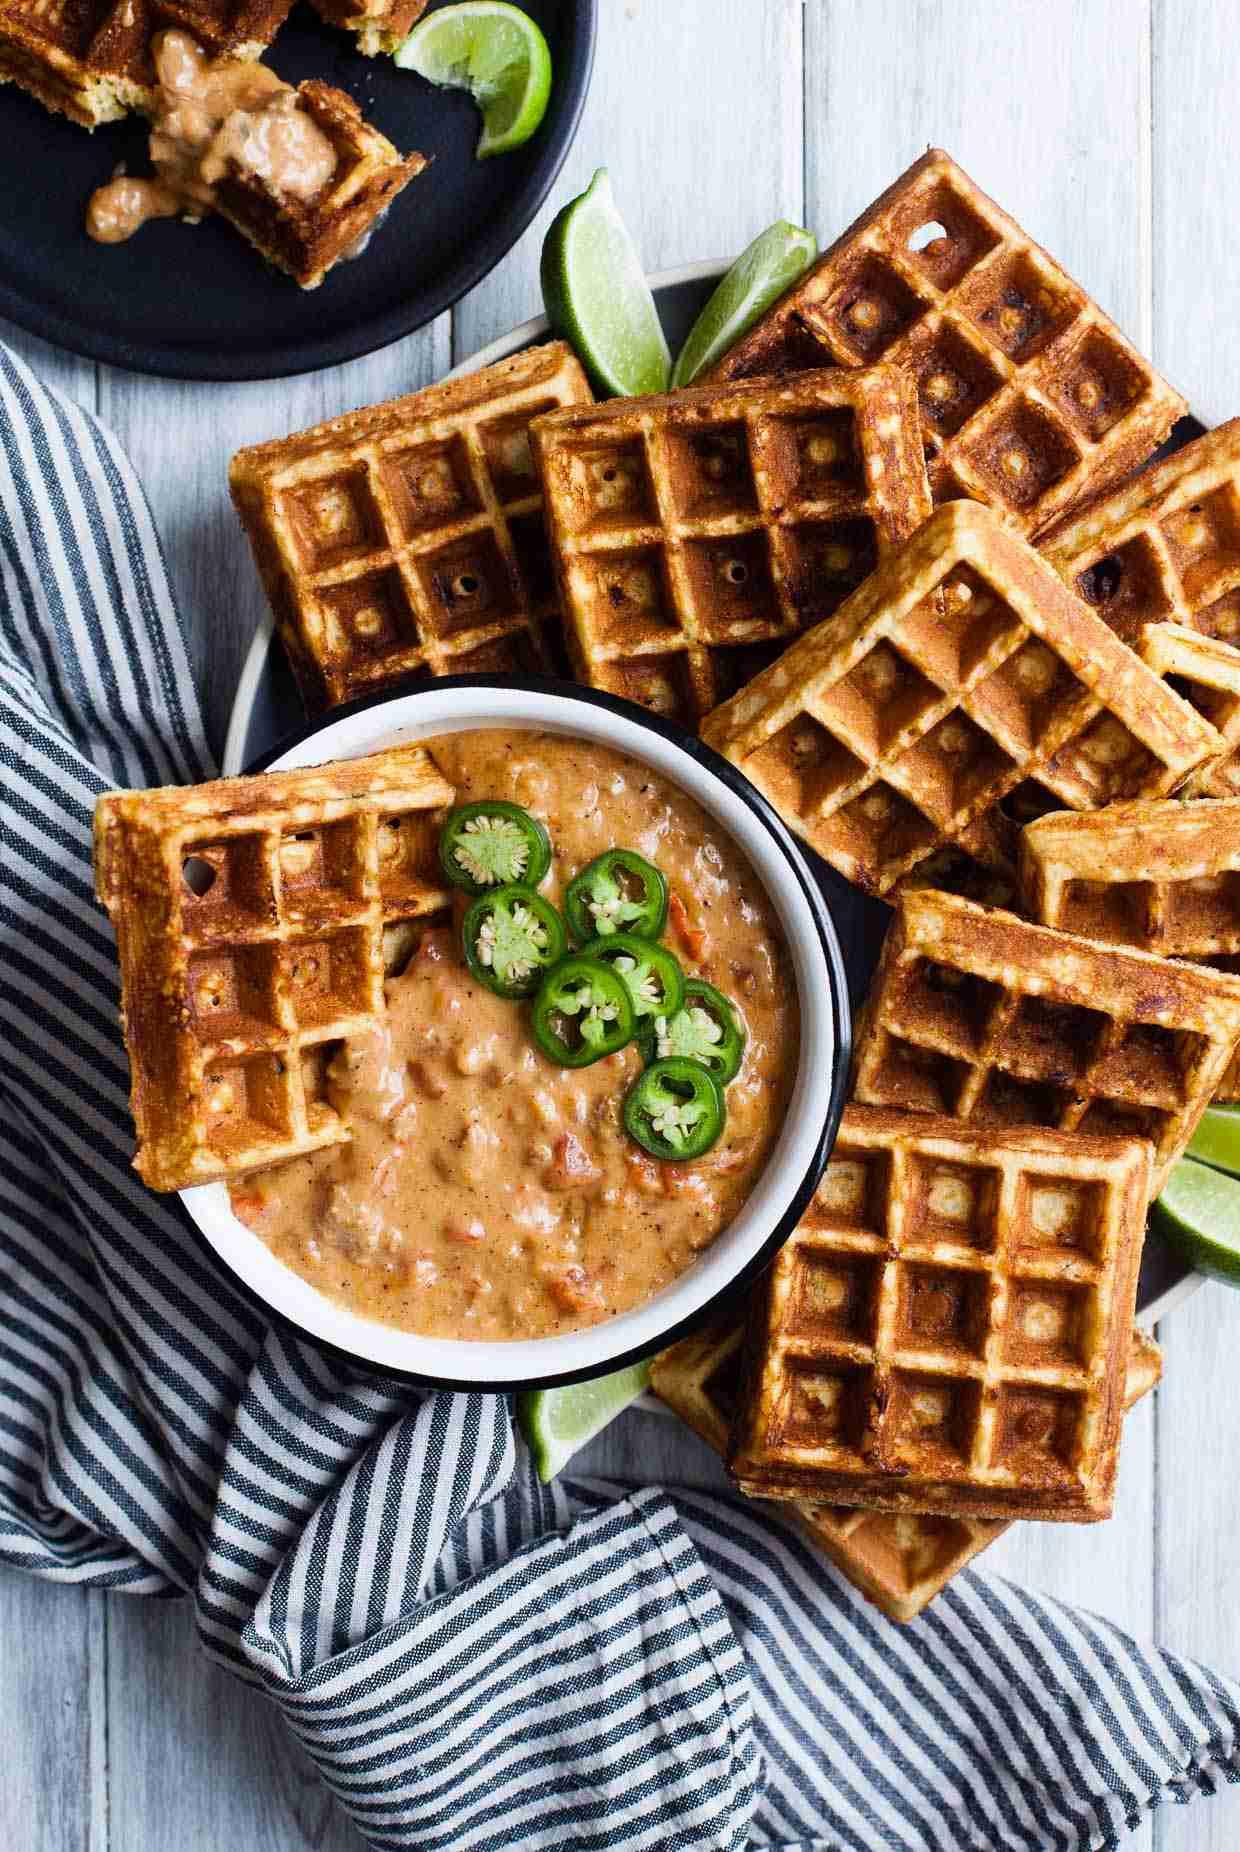 Cheddar Jalapeño Cornbread Waffles with Turkey Chile Con Queso Dip {gluten-free} - Snixy Kitchen - Snixy Kitchen